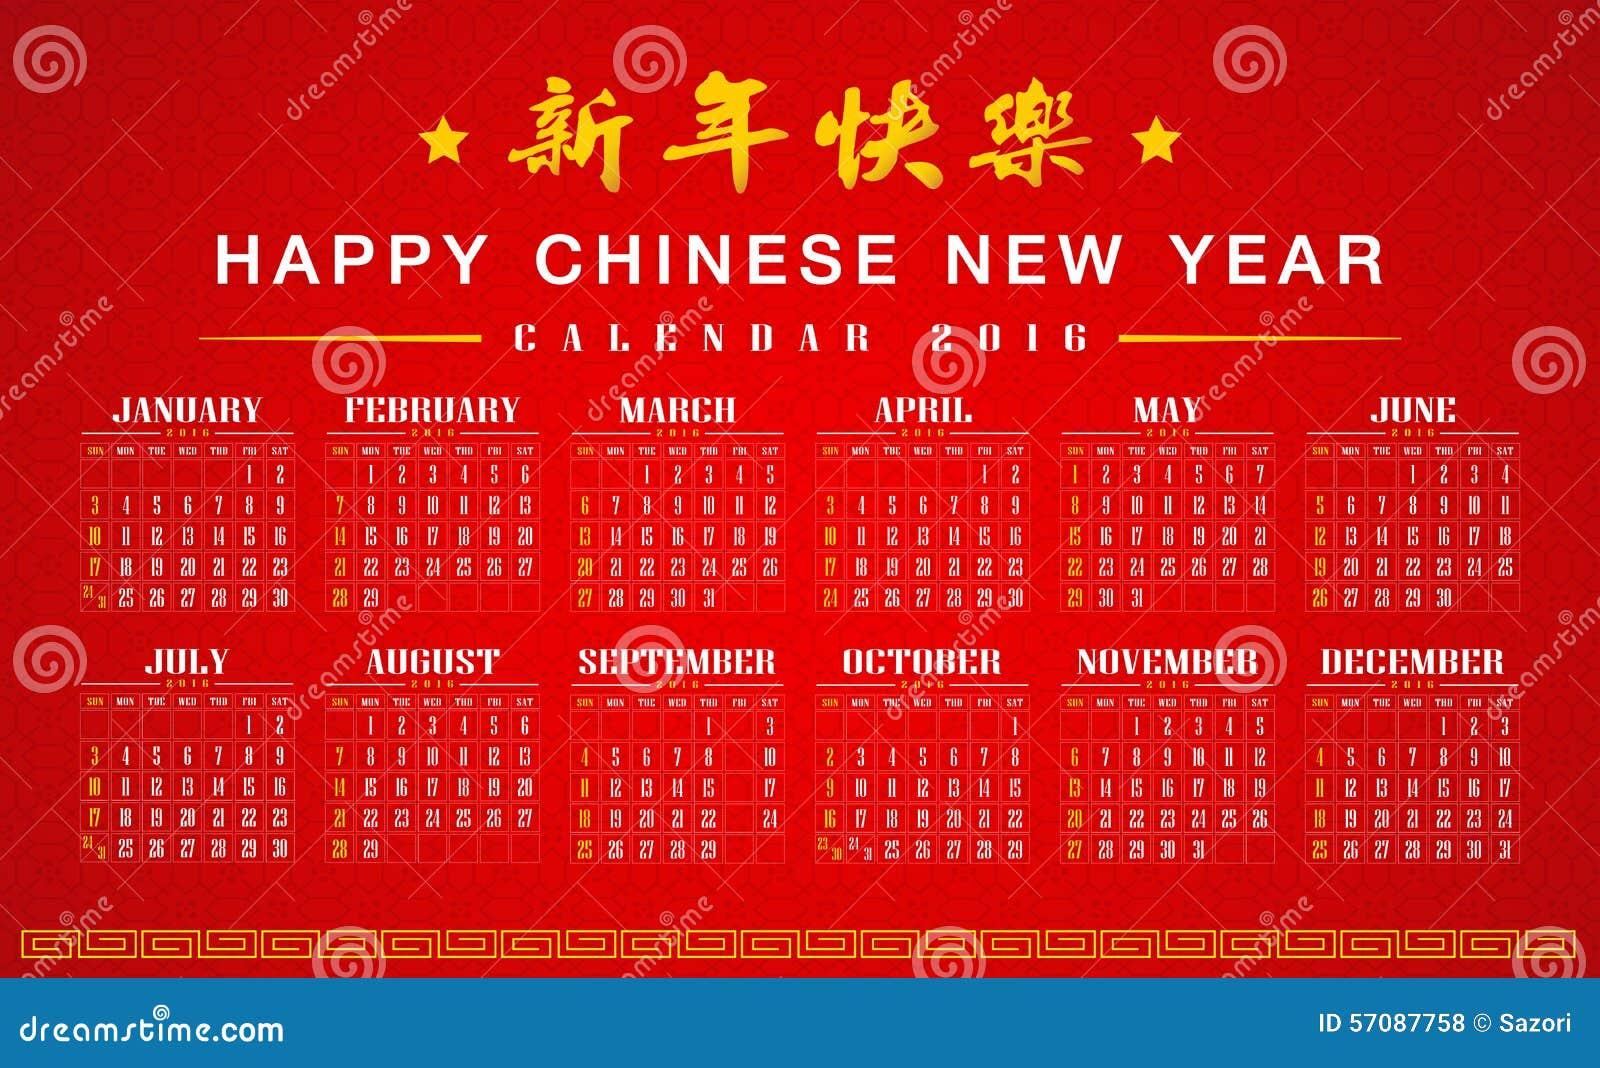 chinesischer kalender autos post. Black Bedroom Furniture Sets. Home Design Ideas